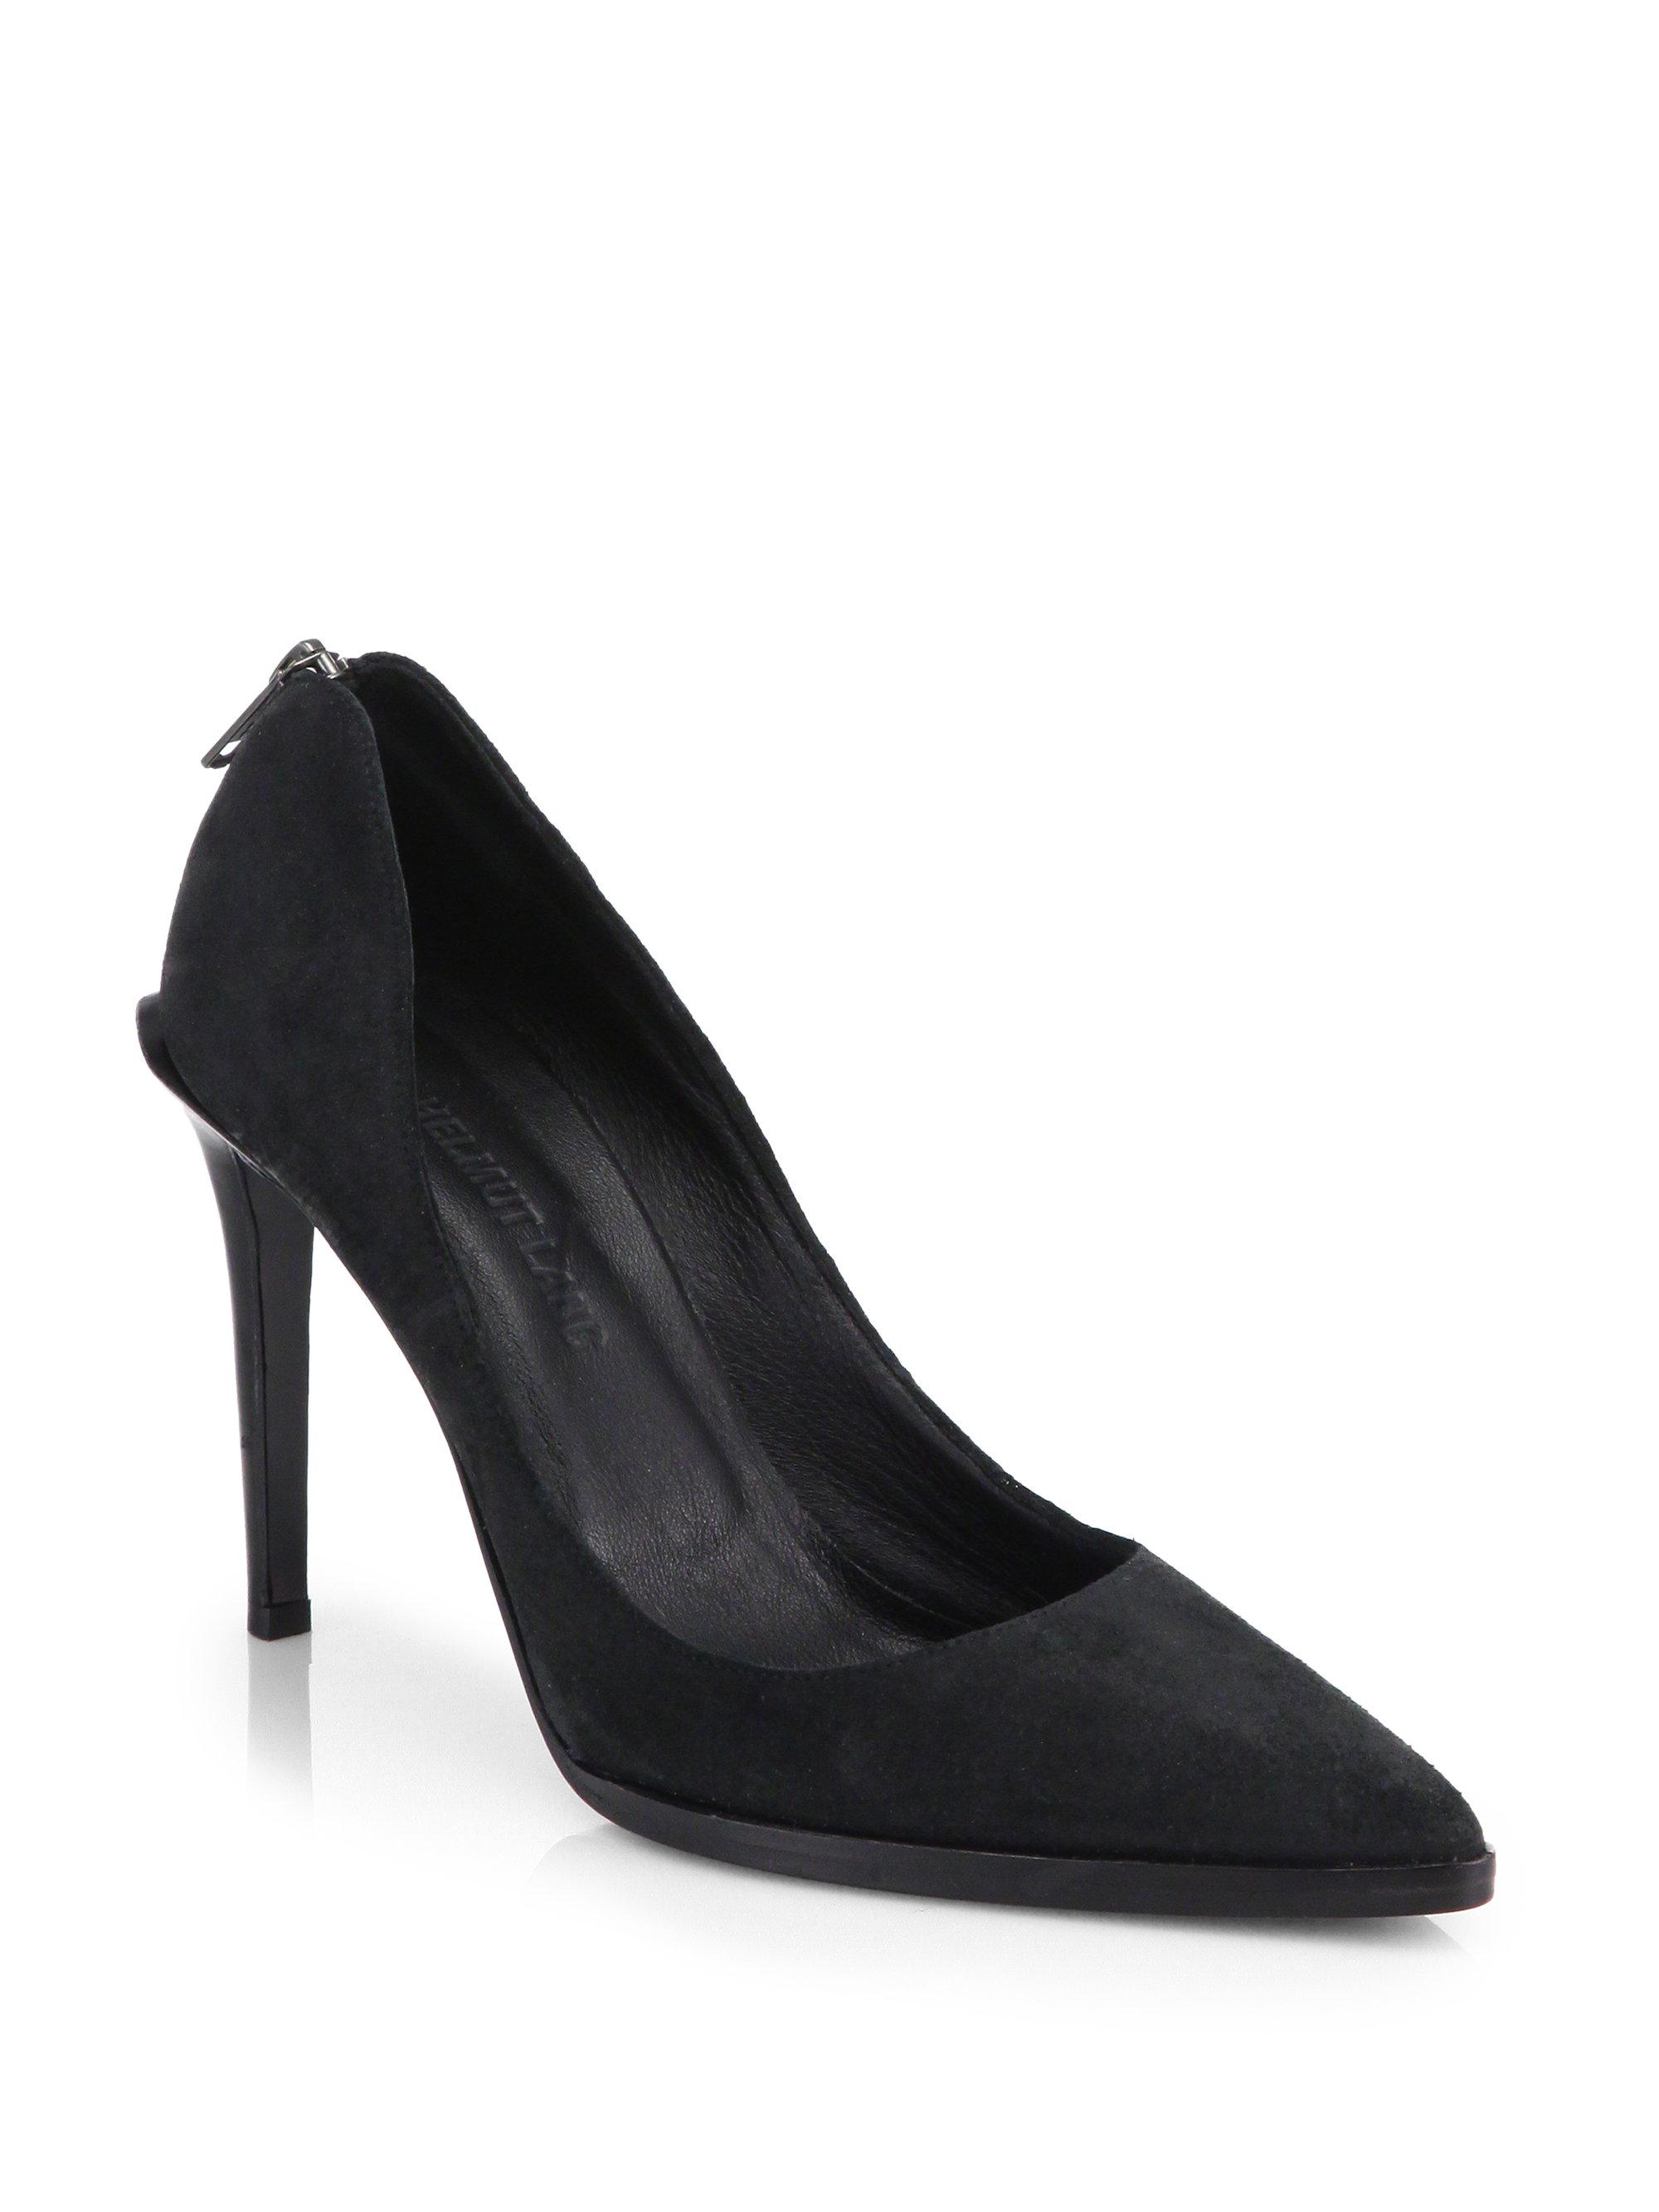 Helmut Lang Patent Leather Heels Latest Discount XIQDLc4zd